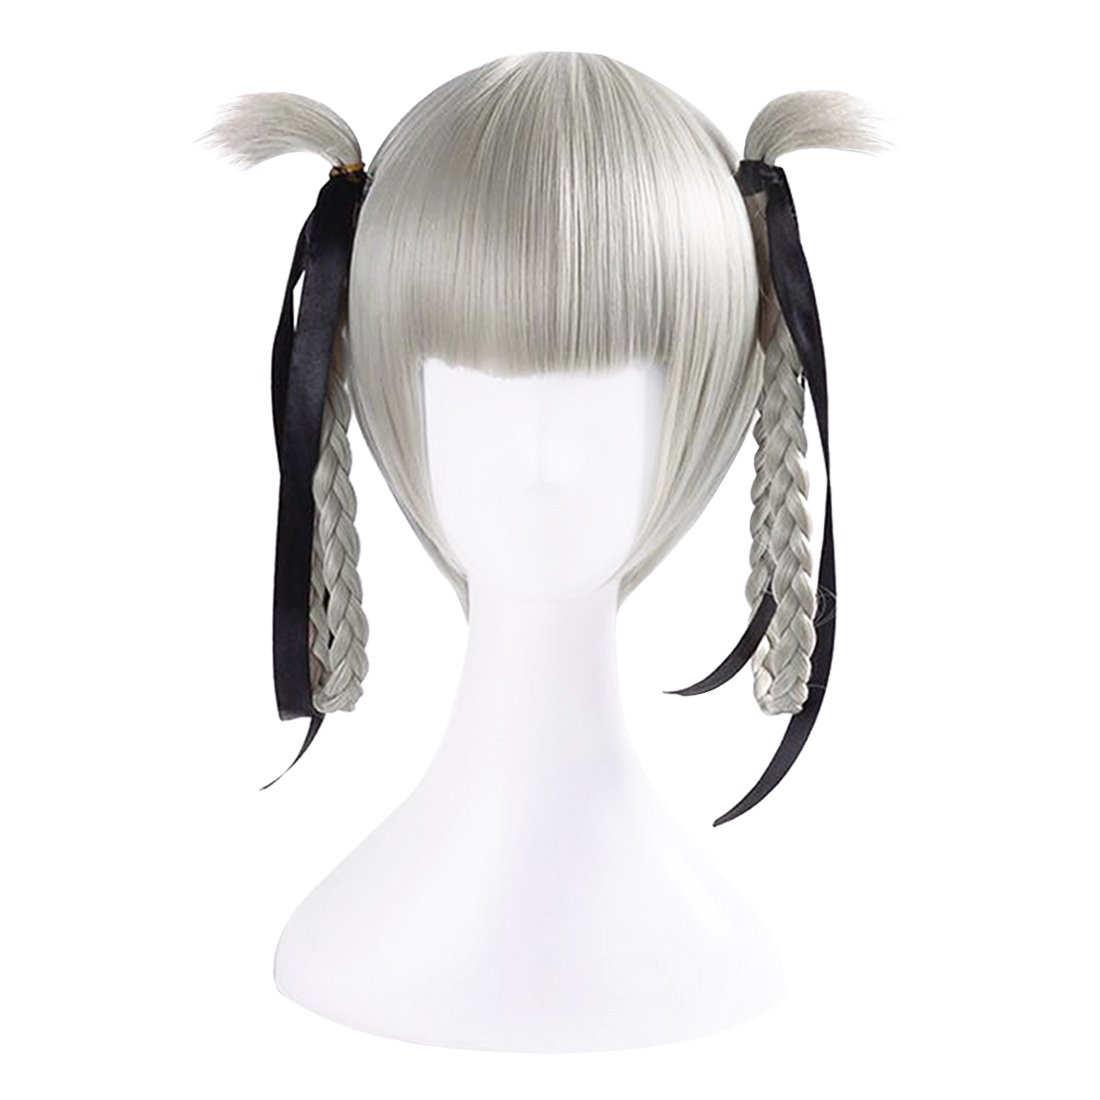 Kirari Momobami Kakegurui Cosplay Braid Hair Wig Hair accessory Gray